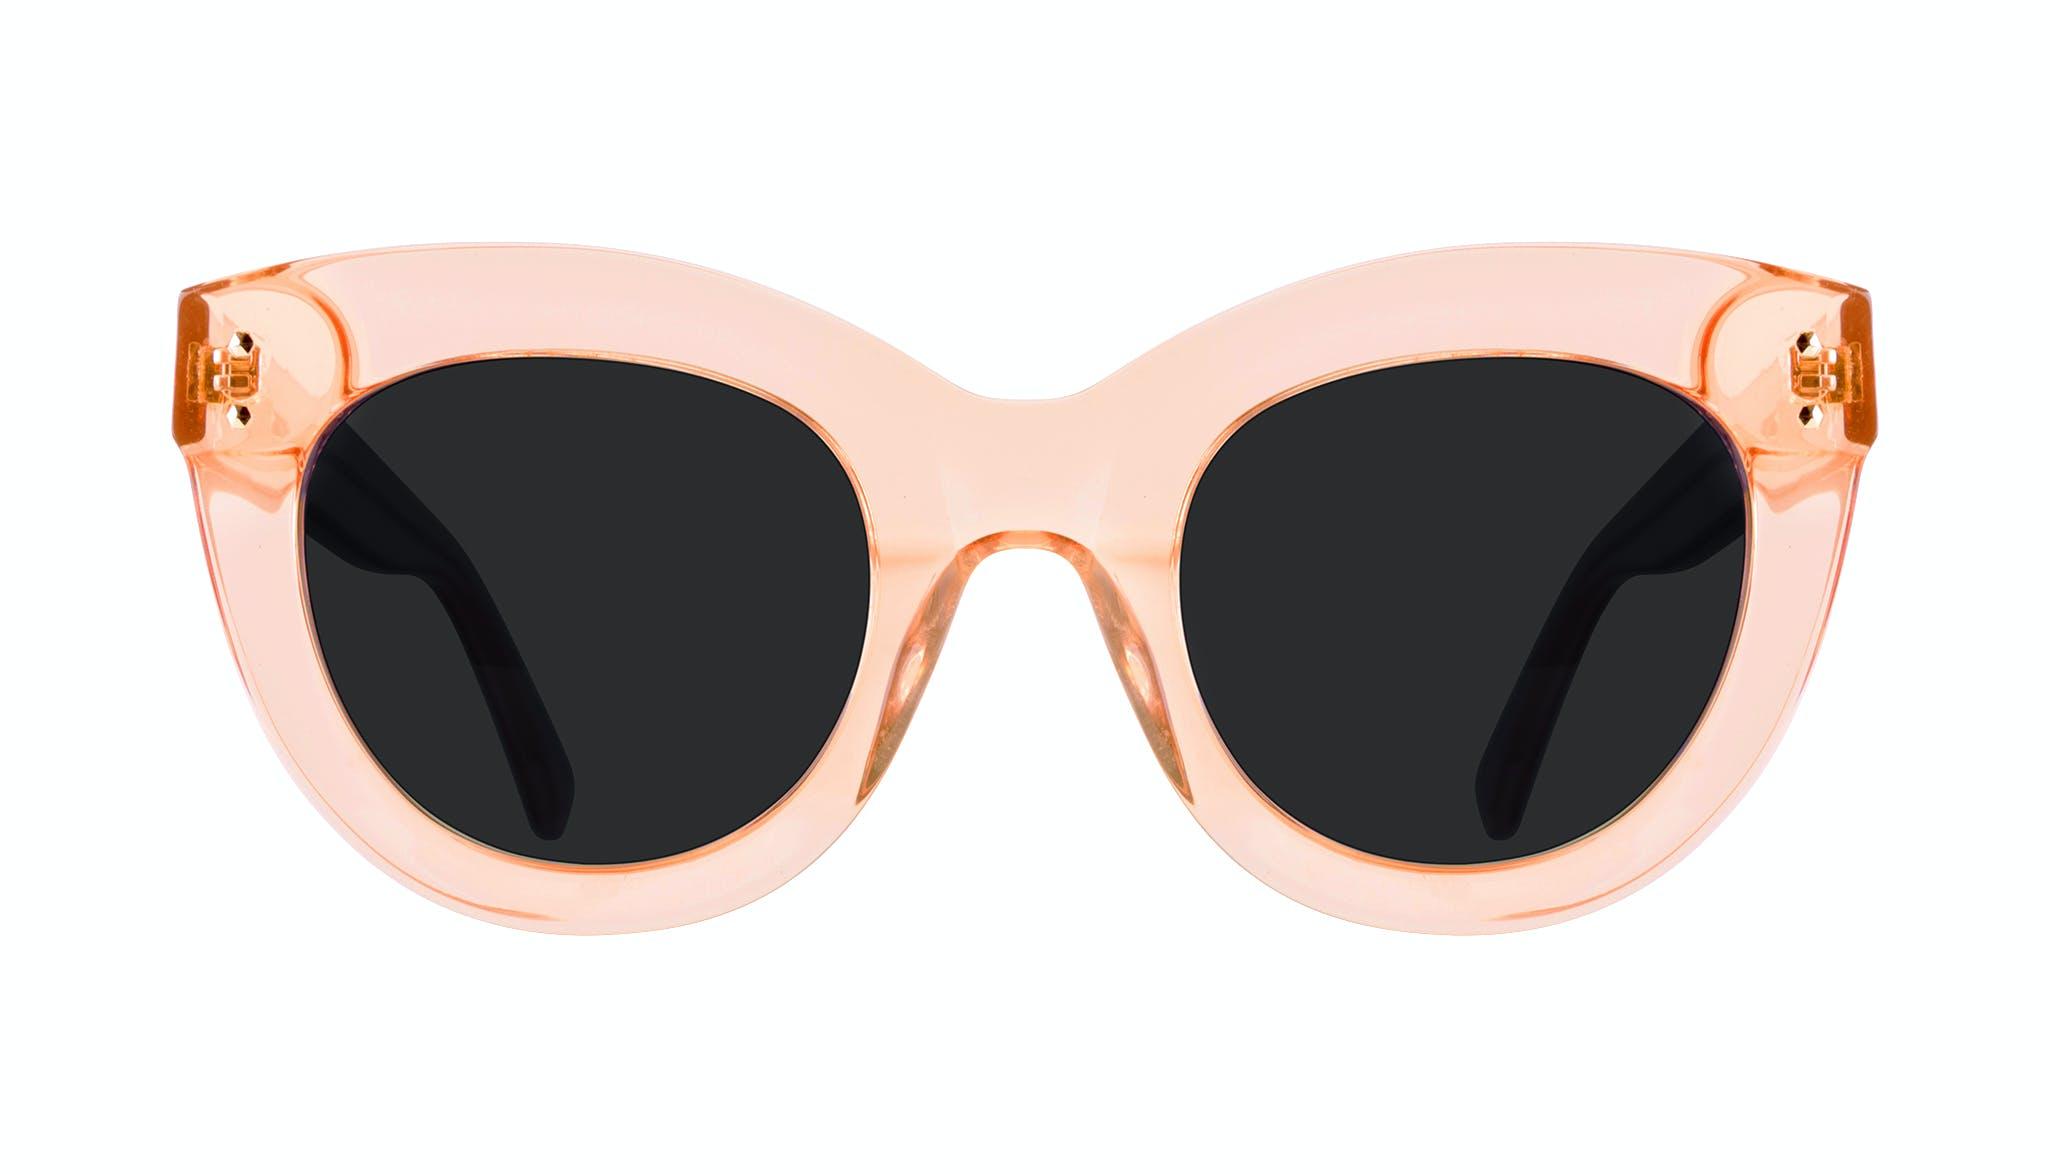 Affordable Fashion Glasses Cat Eye Sunglasses Women Dusk Peach